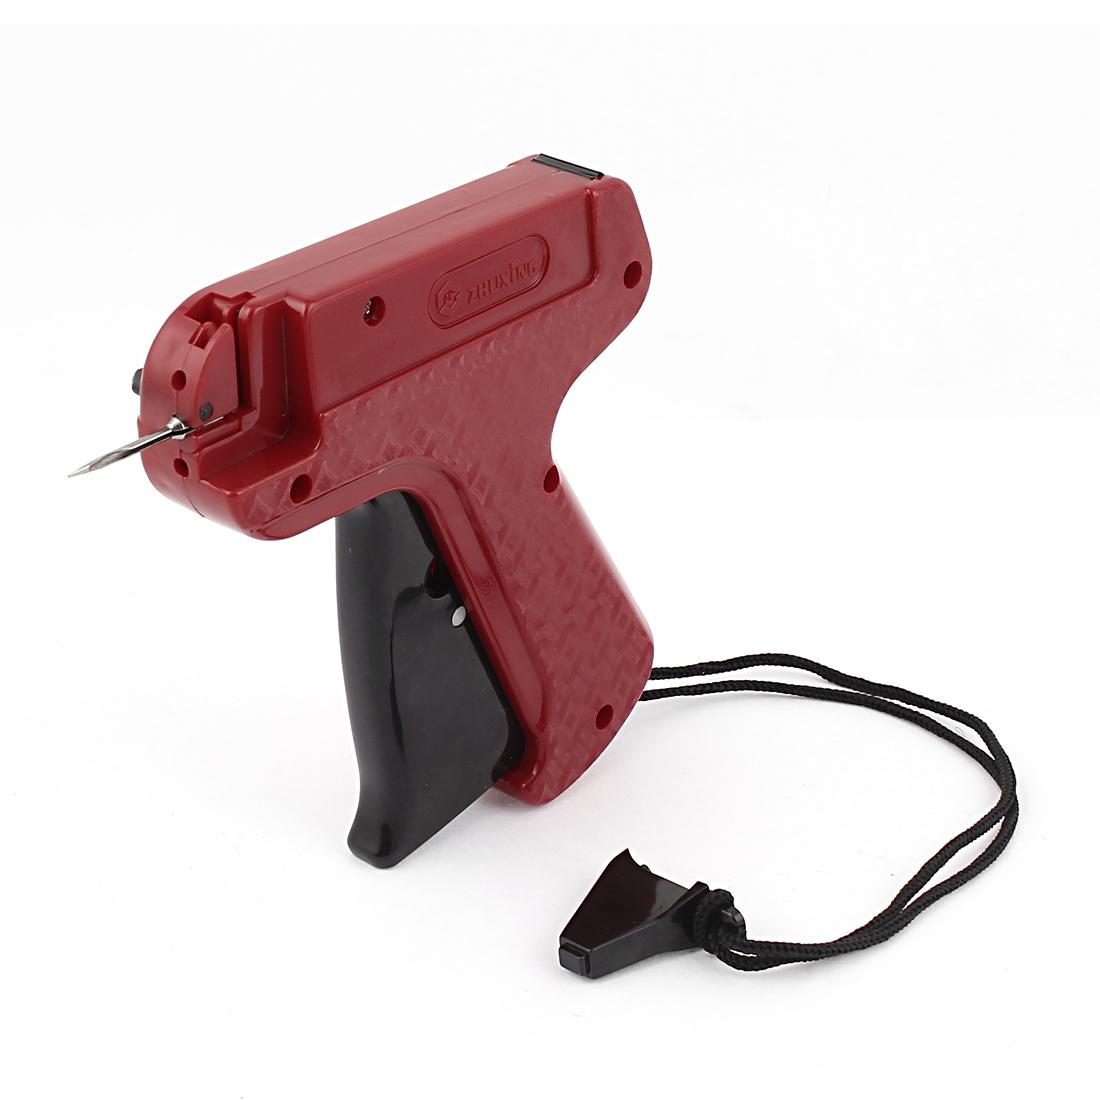 Red Black Plastic Garment Price Labelling Tagging Needle Gun